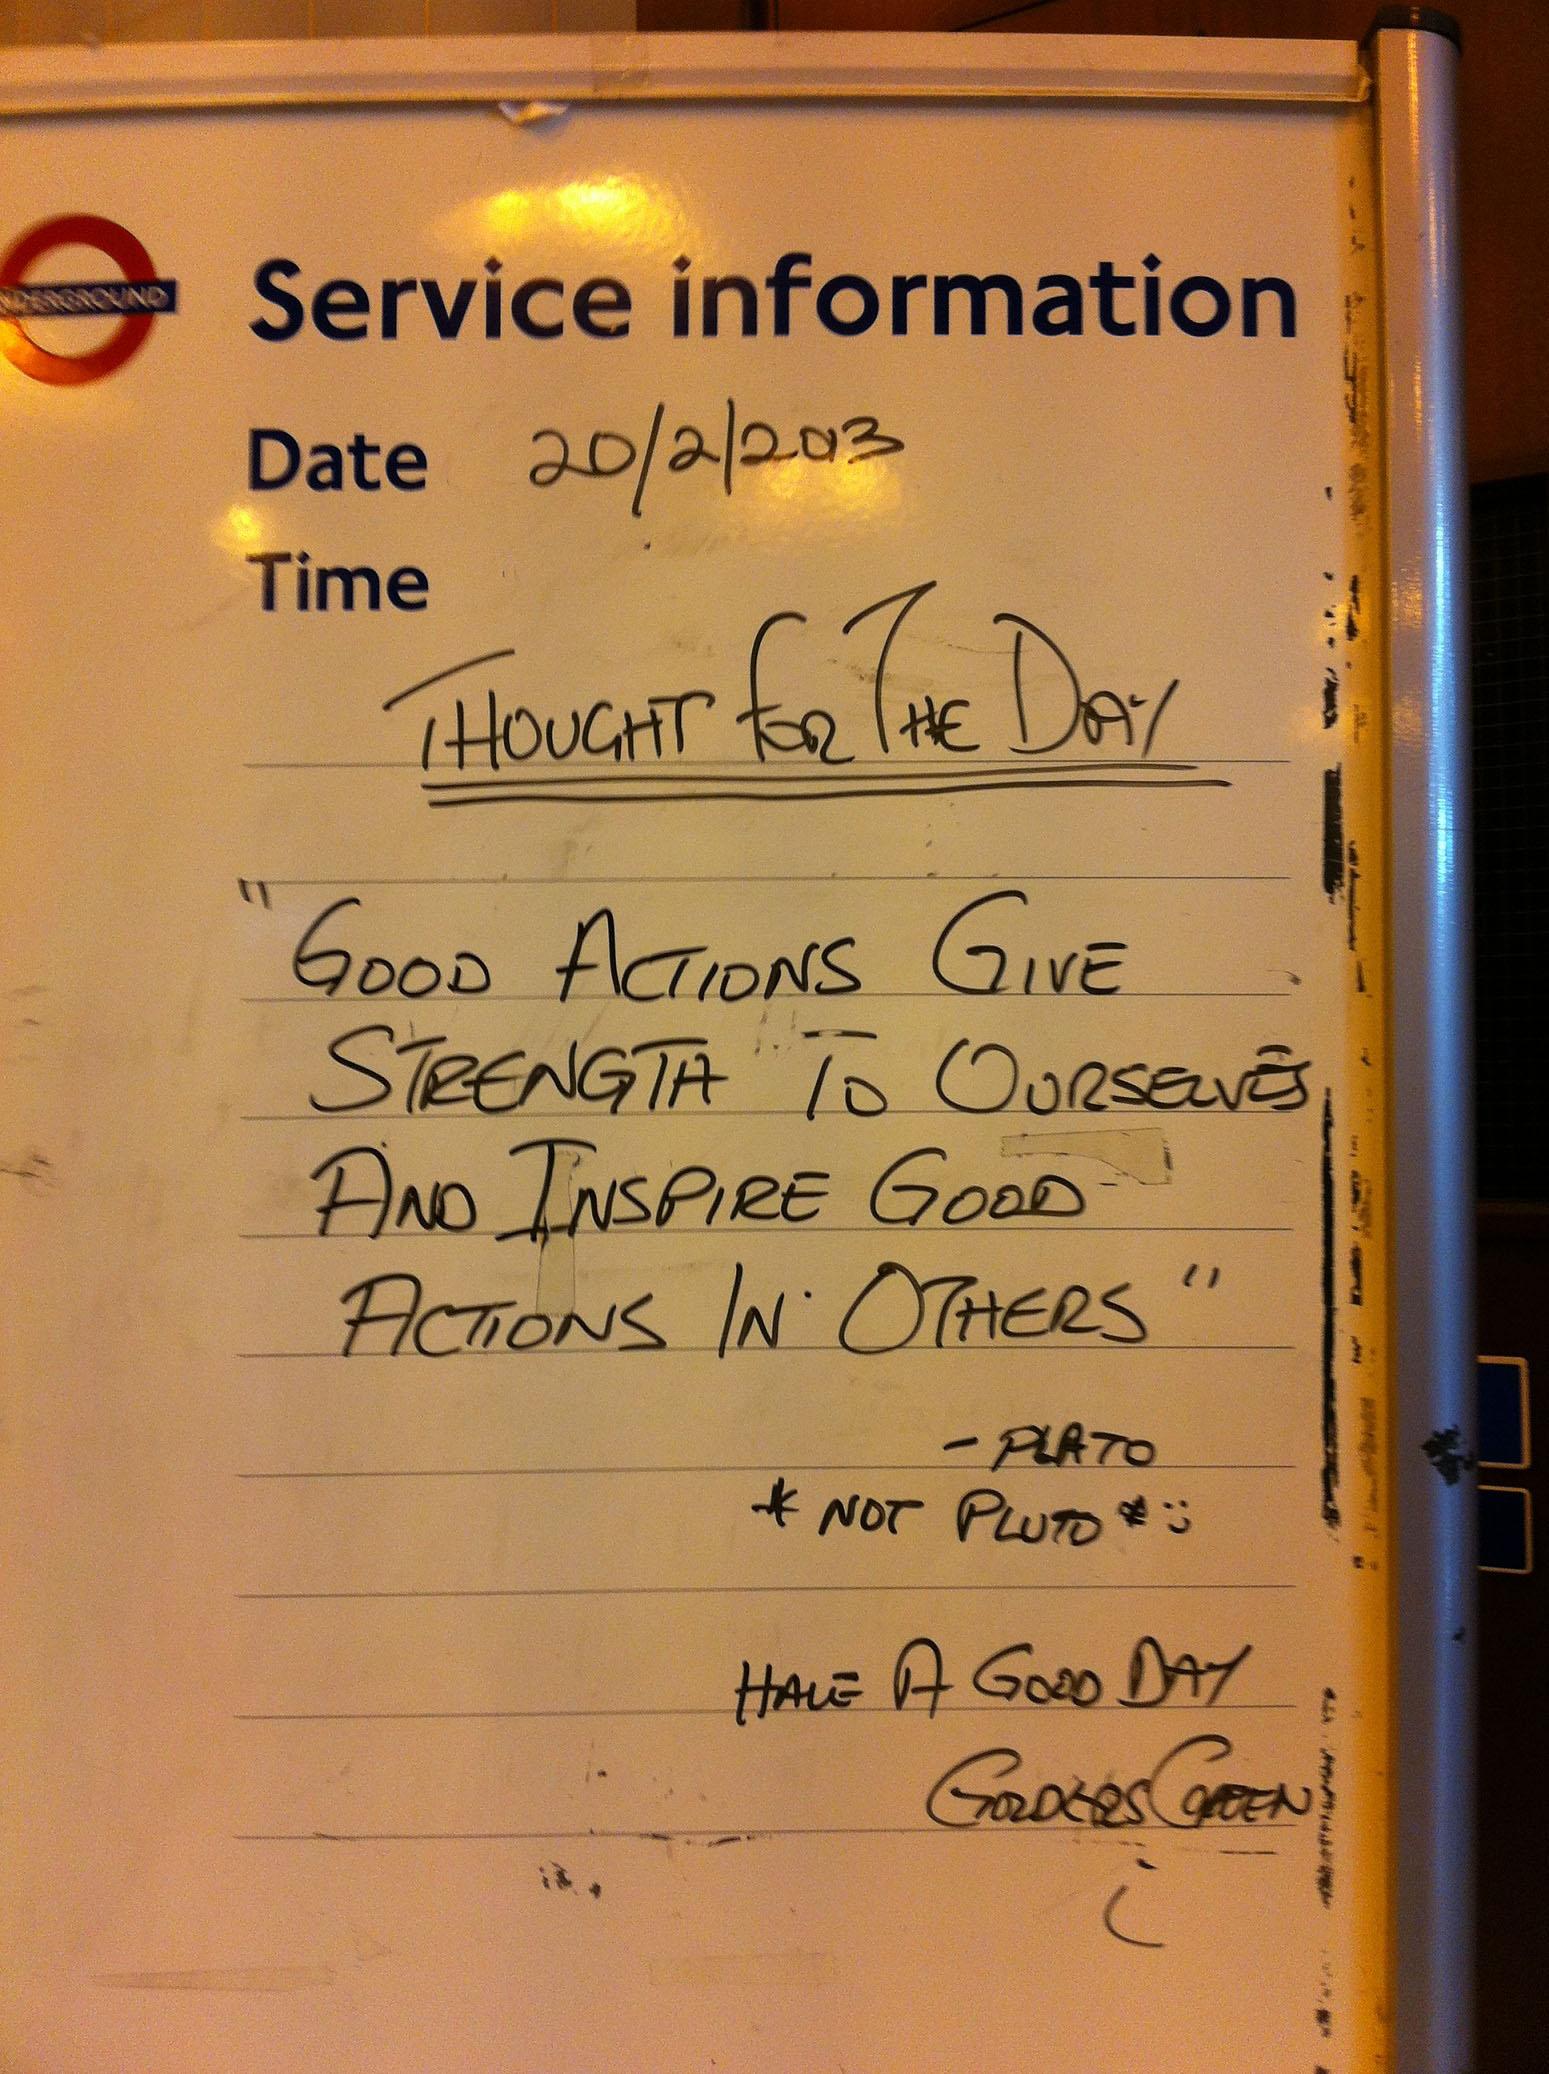 London Tube Service Information Message